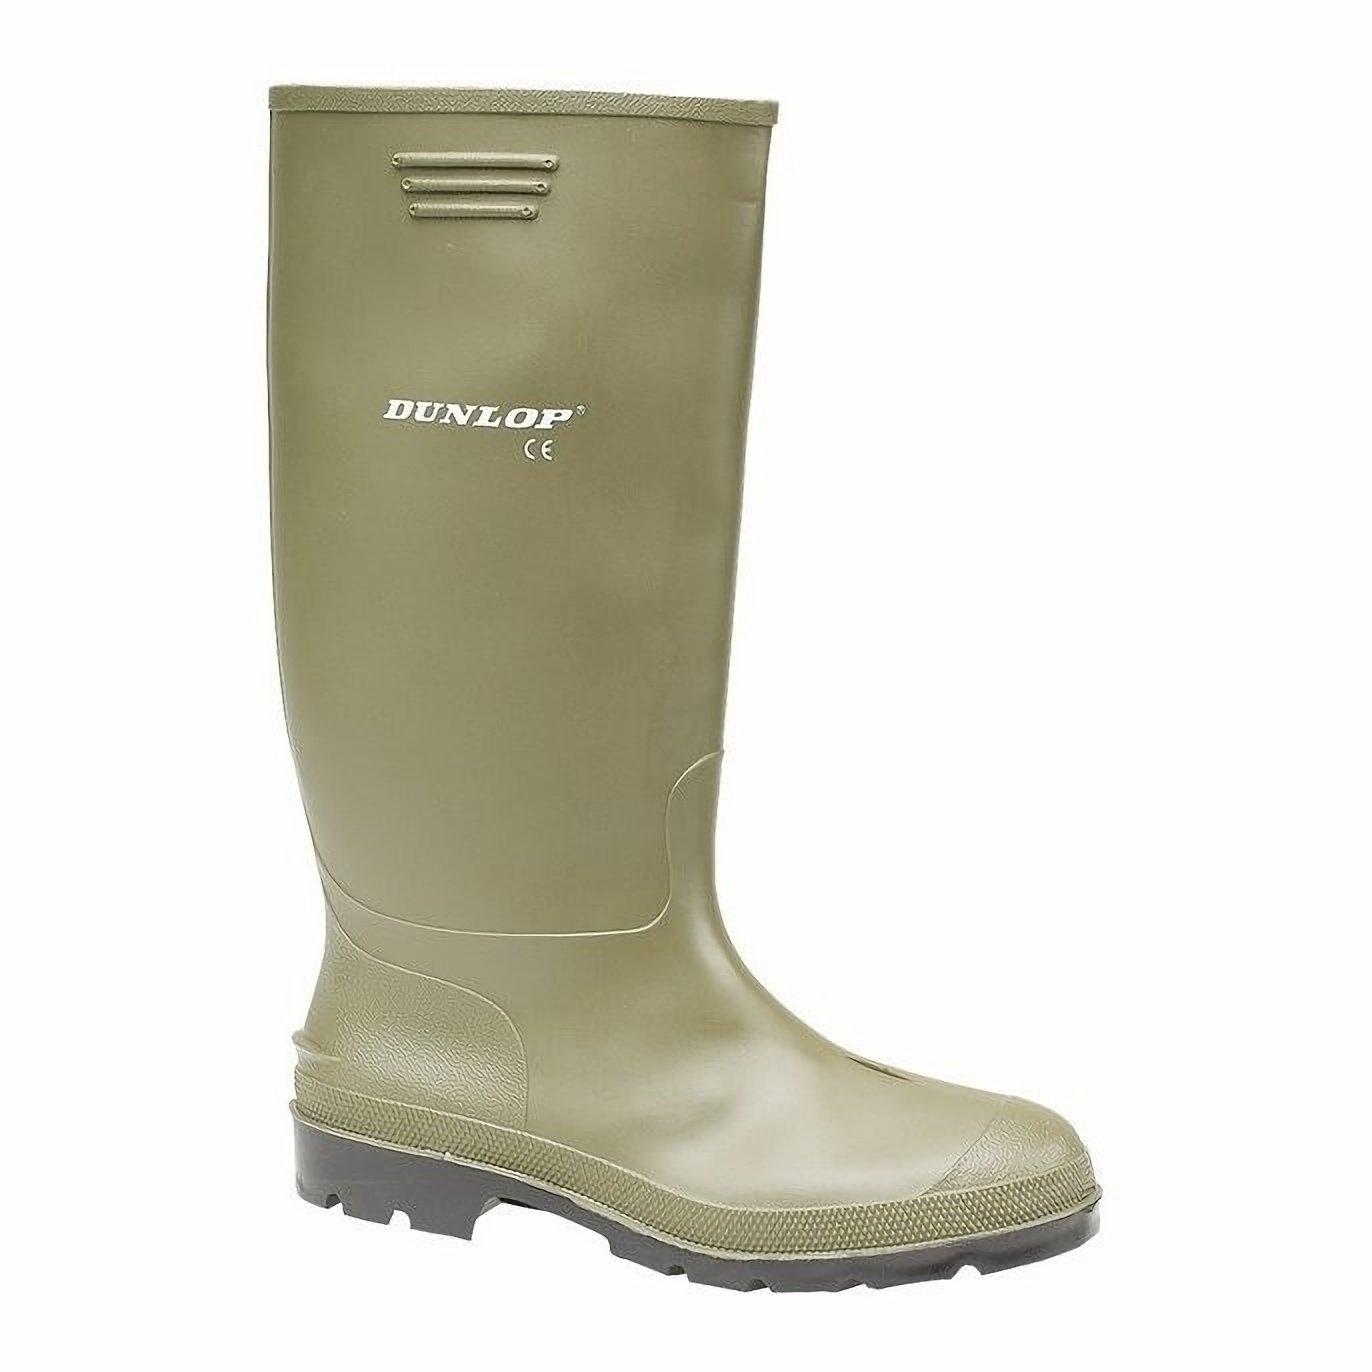 Dunlop Pricemastor PVC Welly/Mens Wellington Boots (11.5 US) (Green)